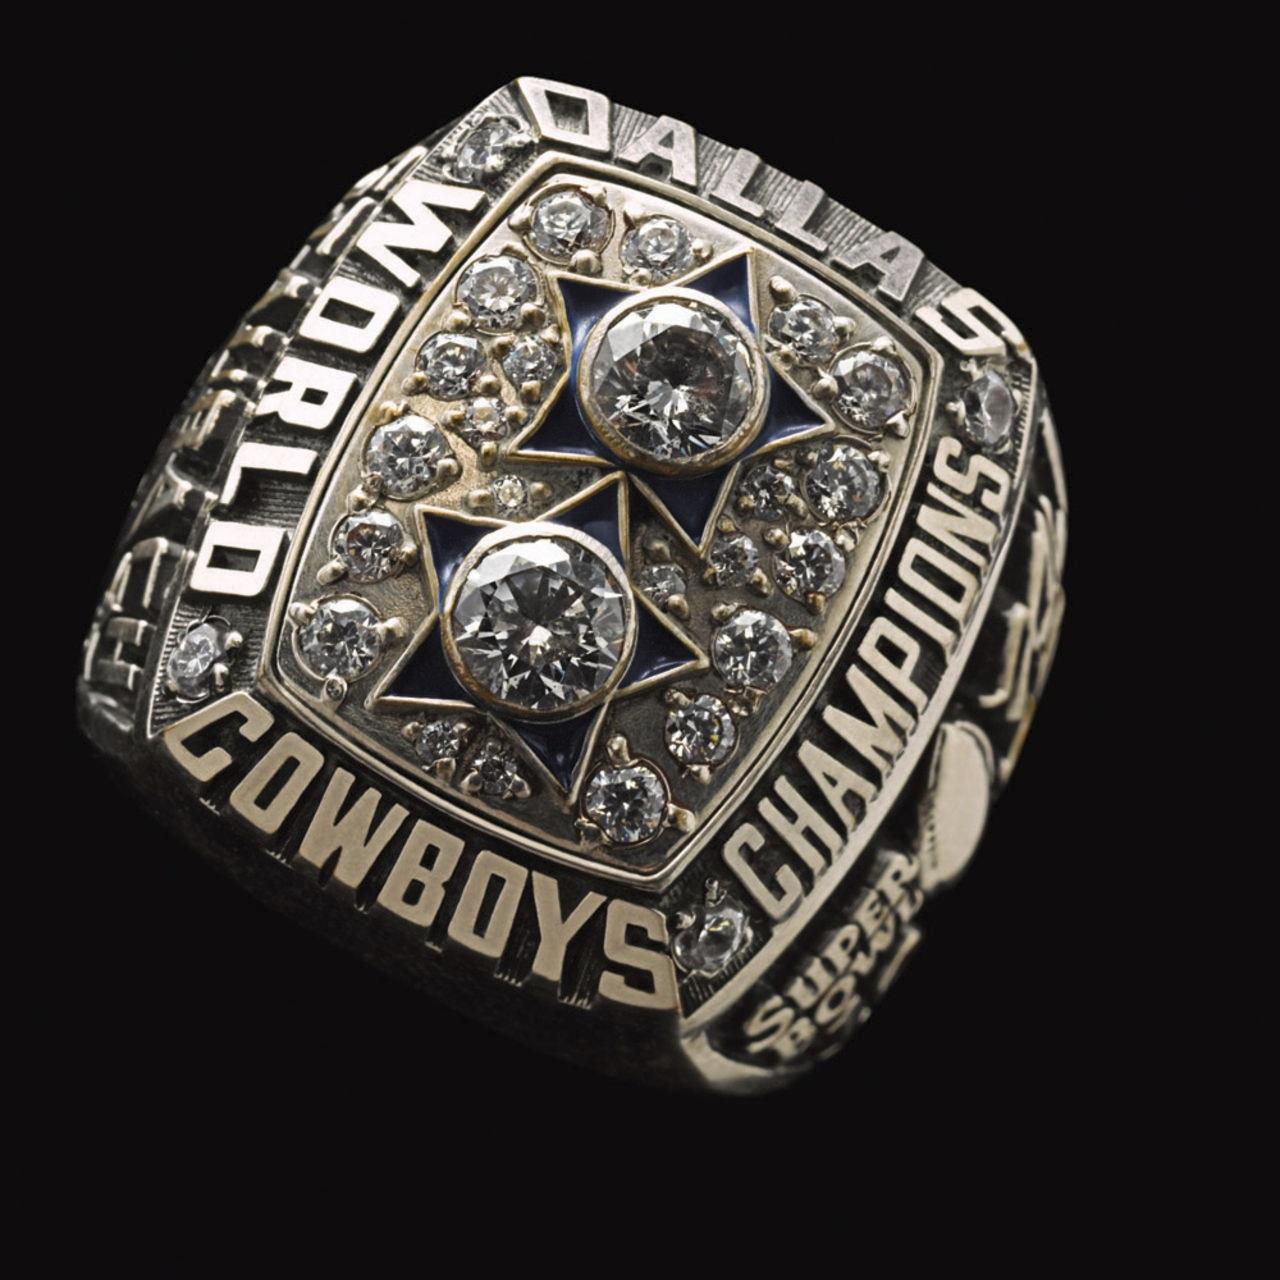 Dallas Cowboys 1978 champions ring